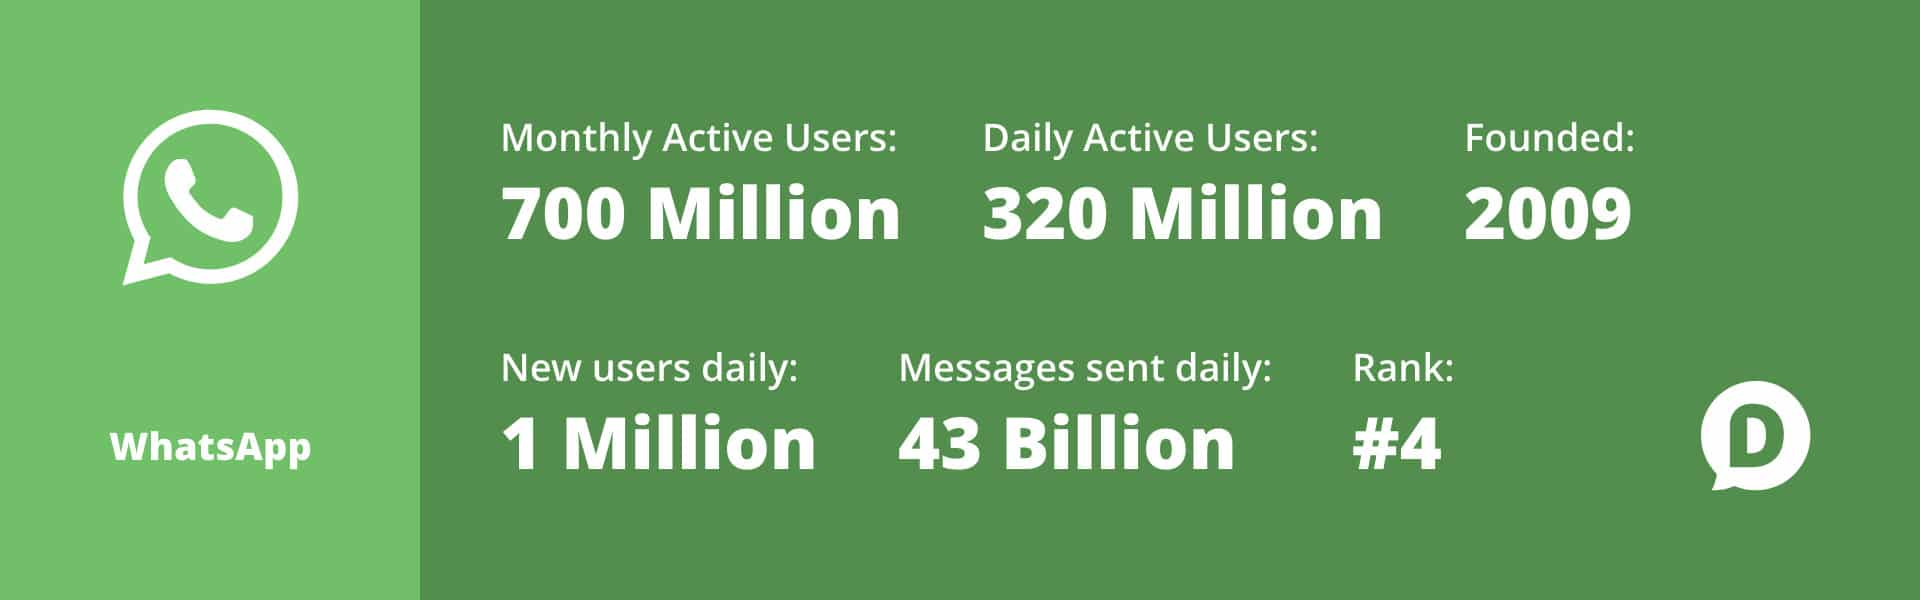 WhatsApp statistics for 2018